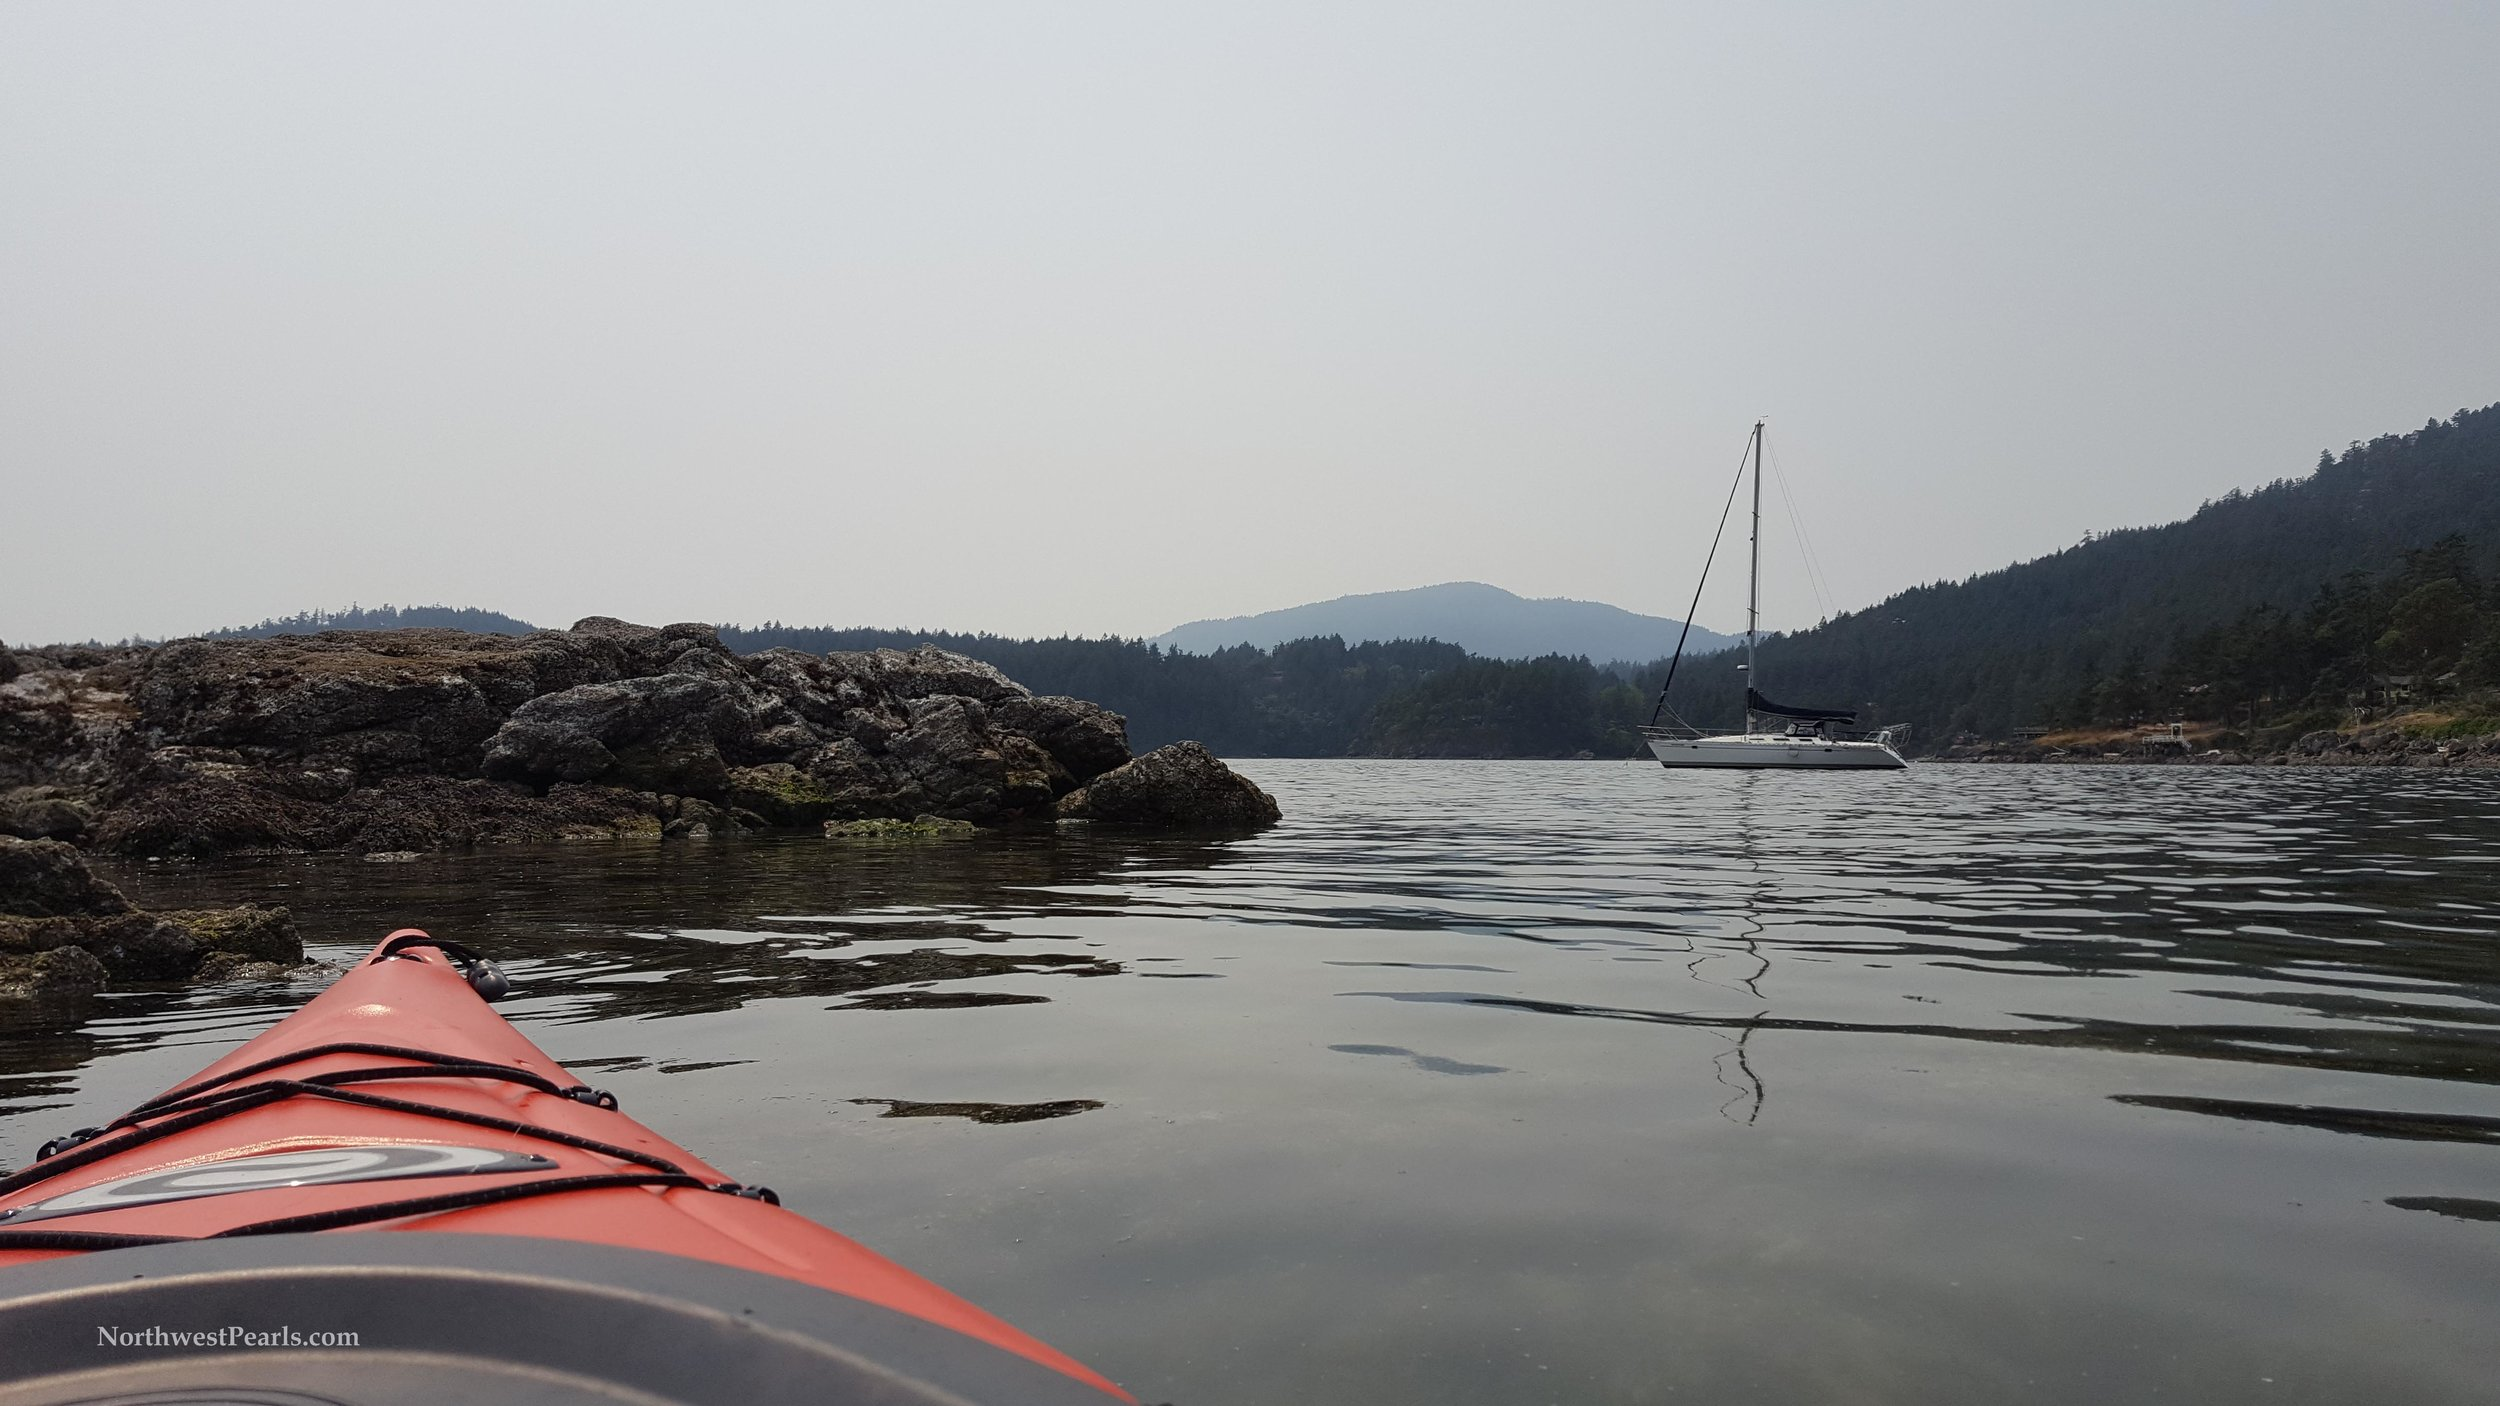 Northwest Pearls    Orcas Island    Blog